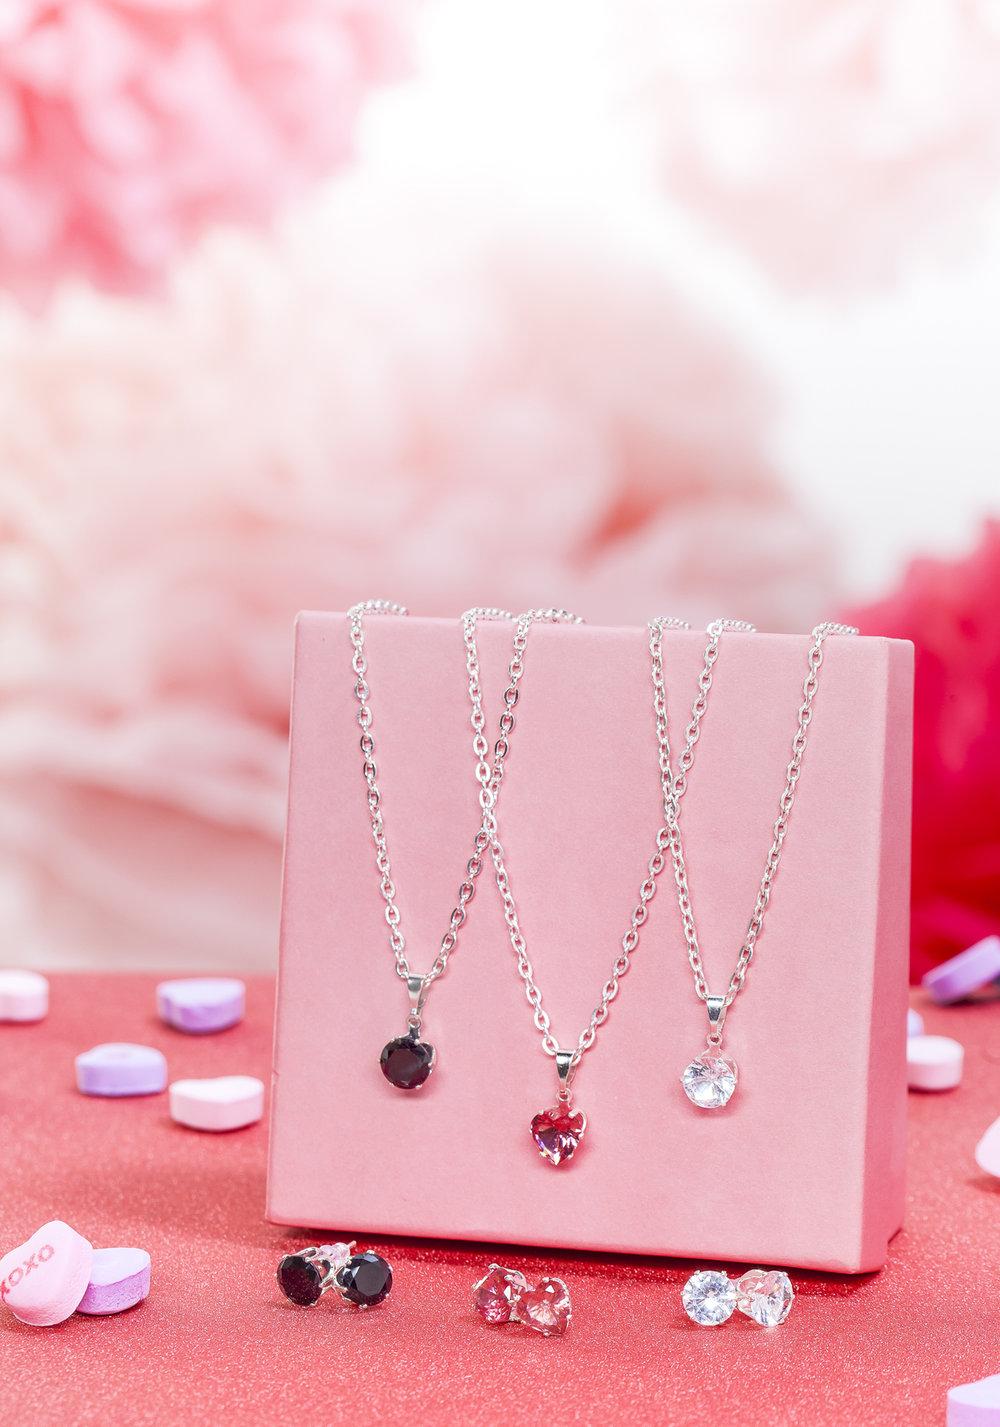 Necklace&Earring_Sets_Jewelry.jpg